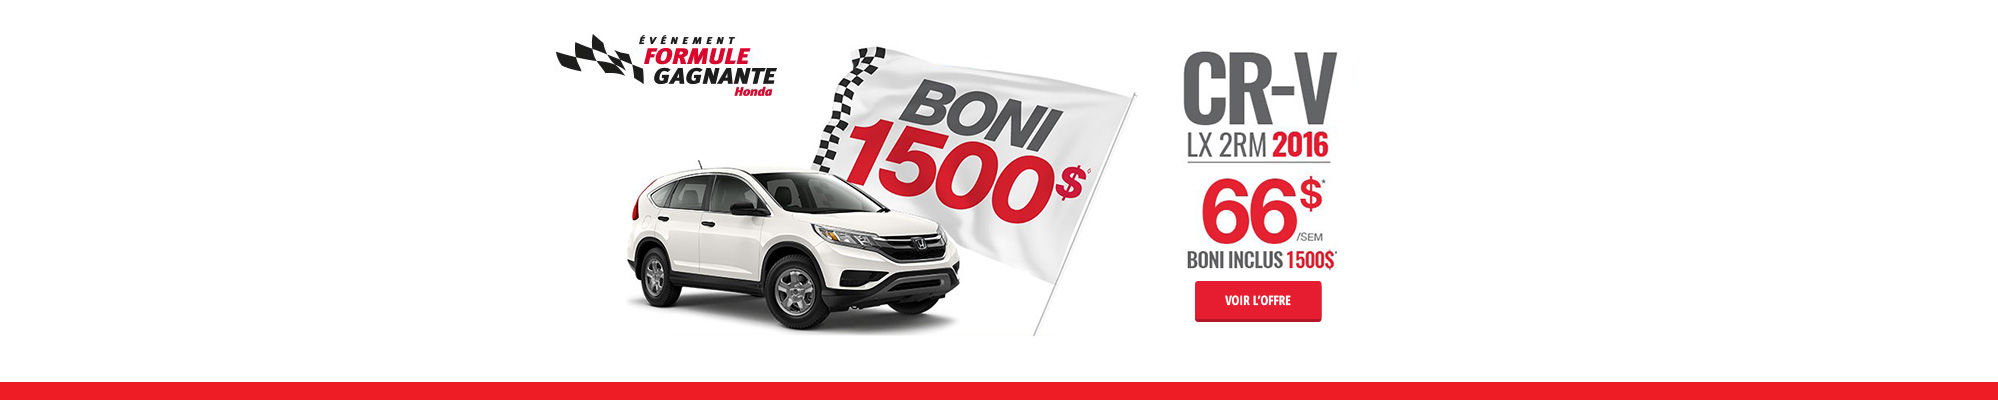 Événement formule gagnante Honda - CR-V